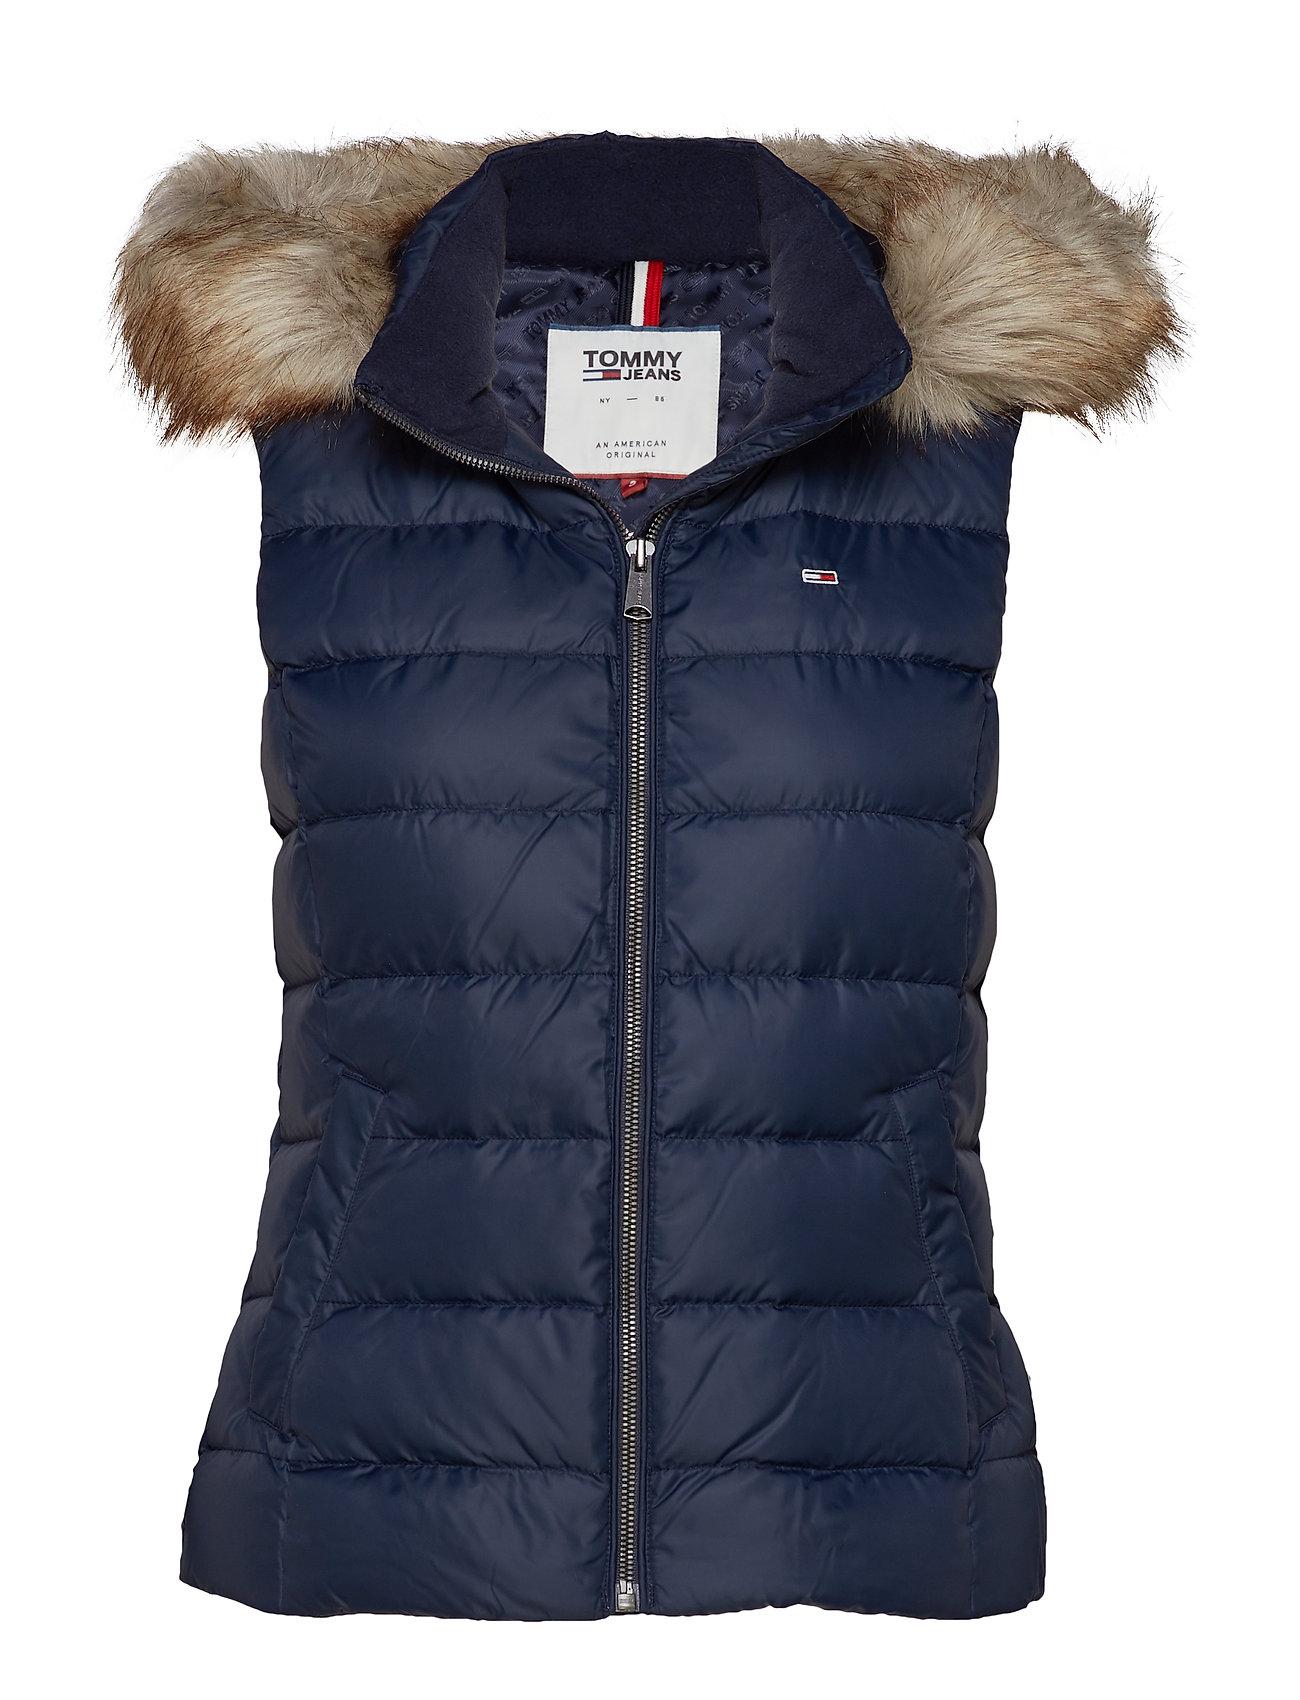 Essential IrisTommy Essential Hoodedblack Jeans Hoodedblack Tjw Tjw 1culTFKJ3